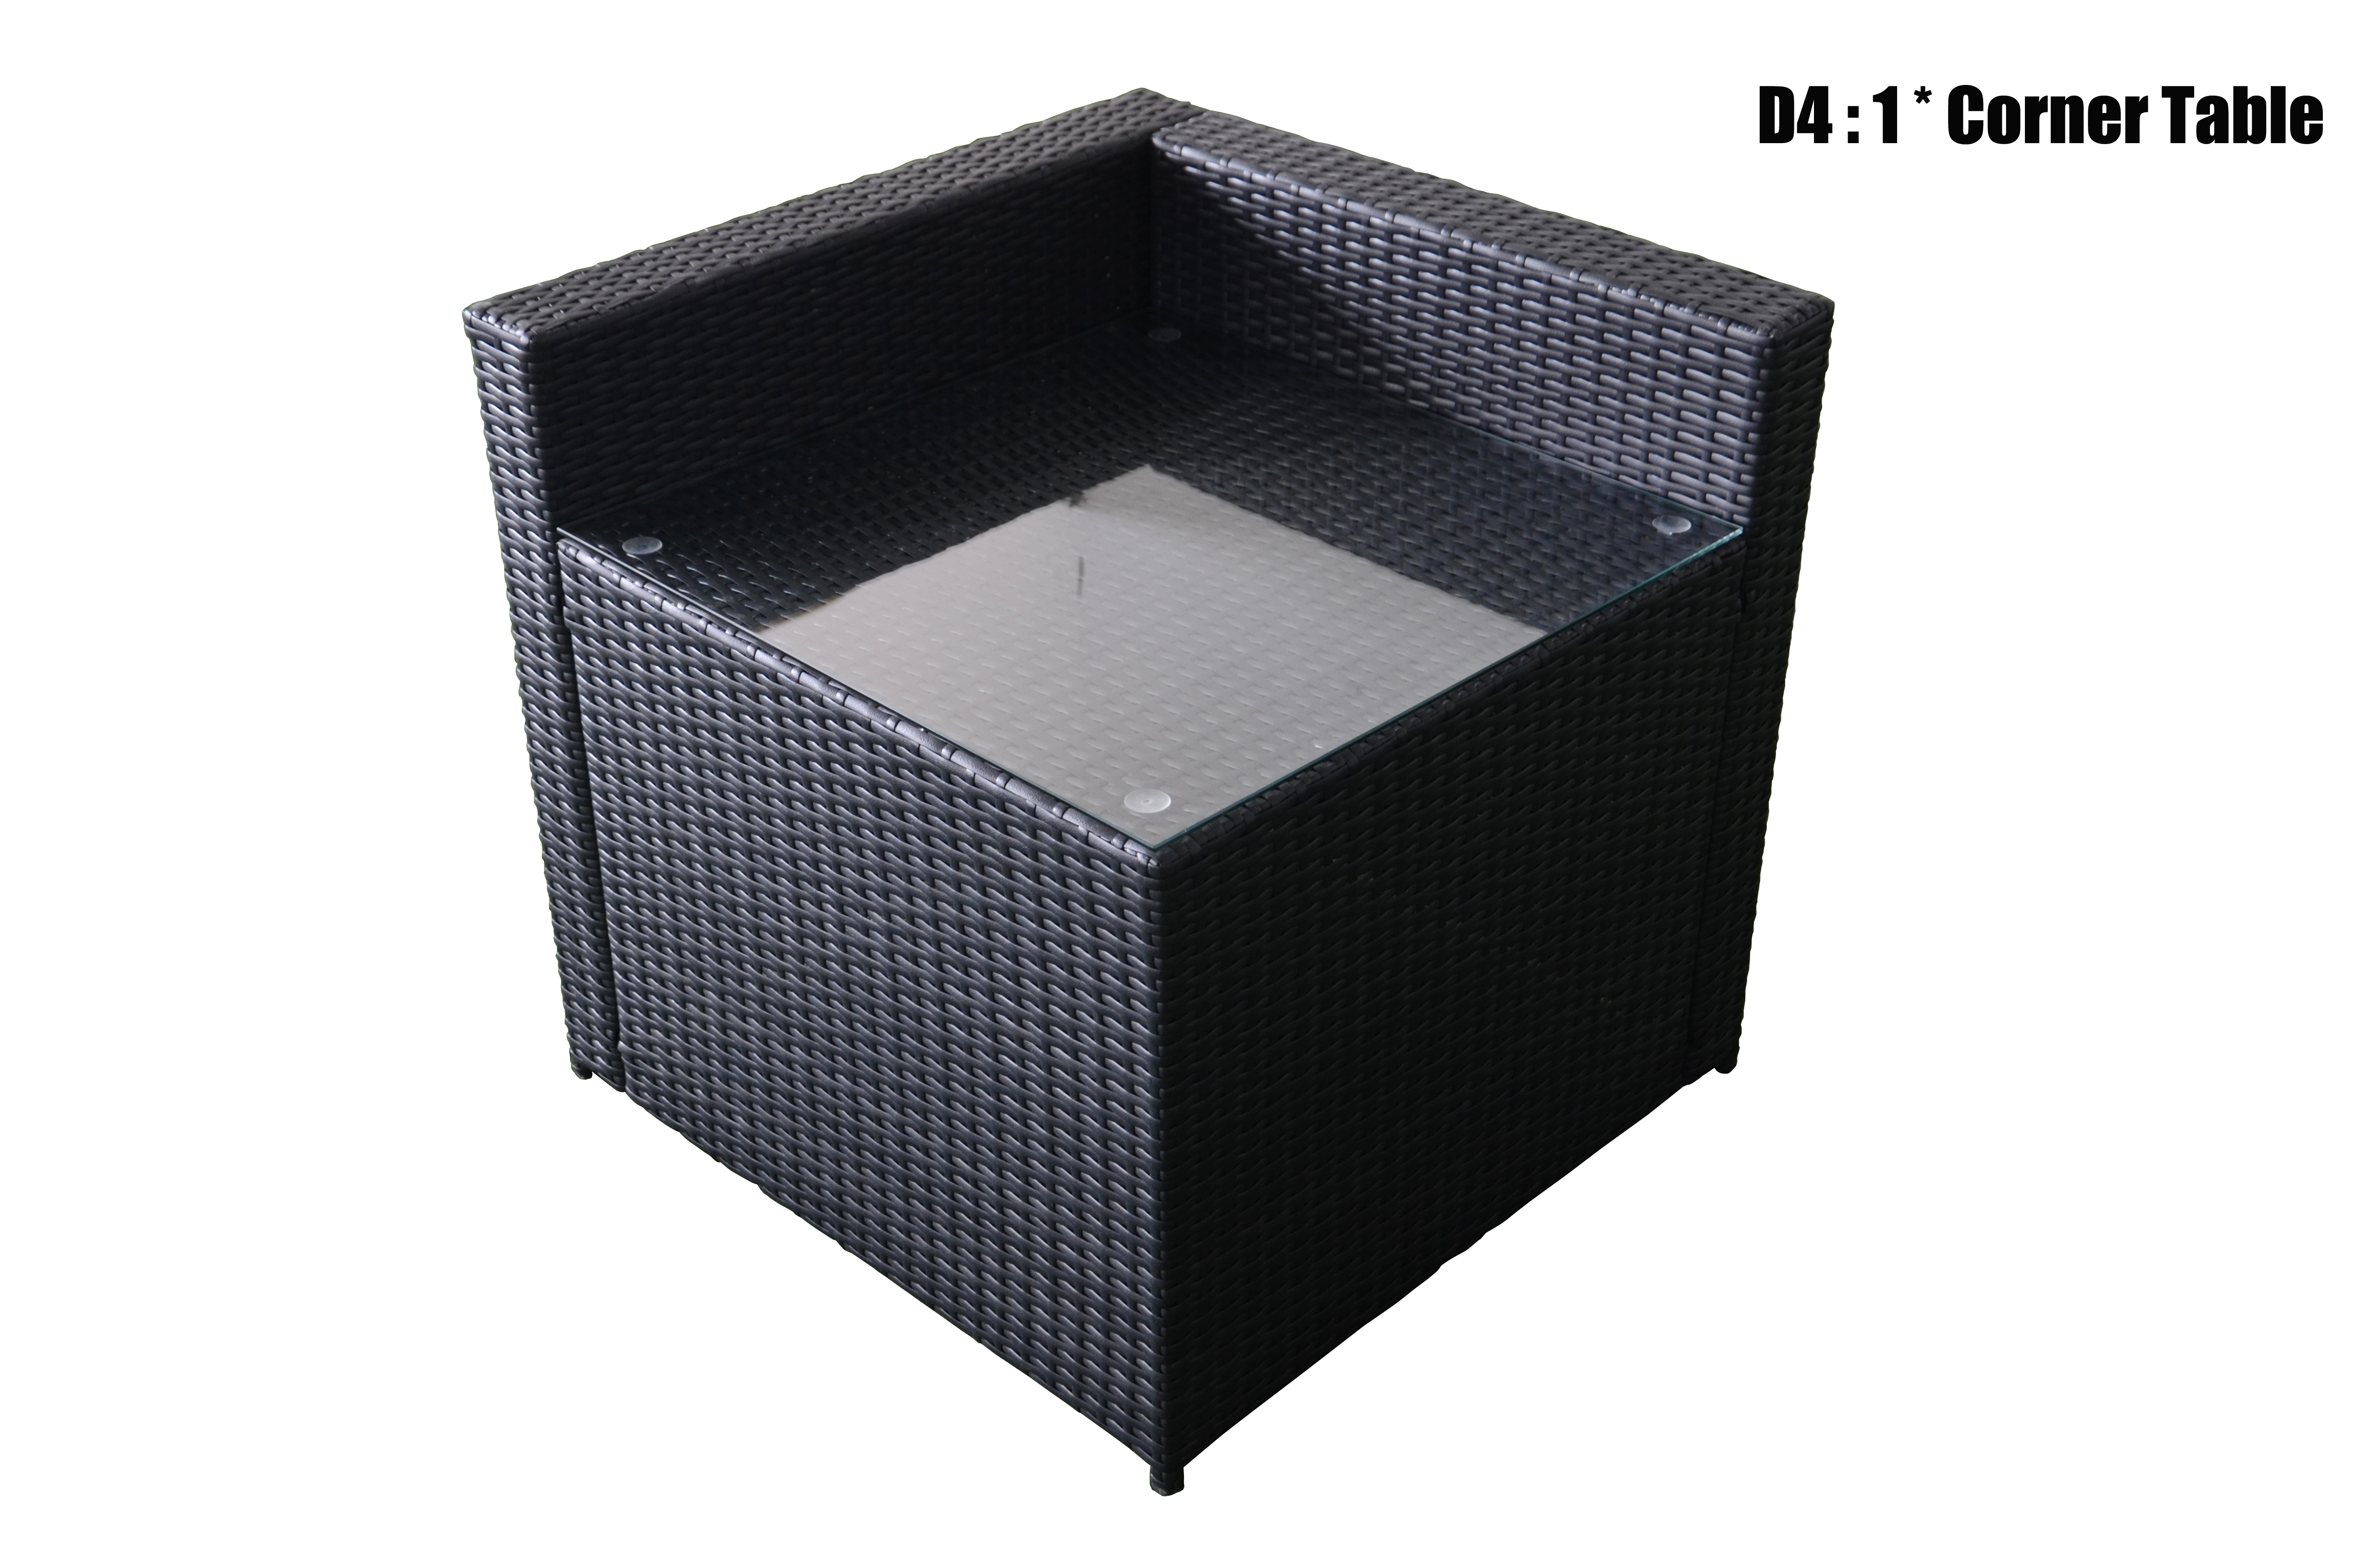 mcombo black wicker diy outdoor sofa patio sectional